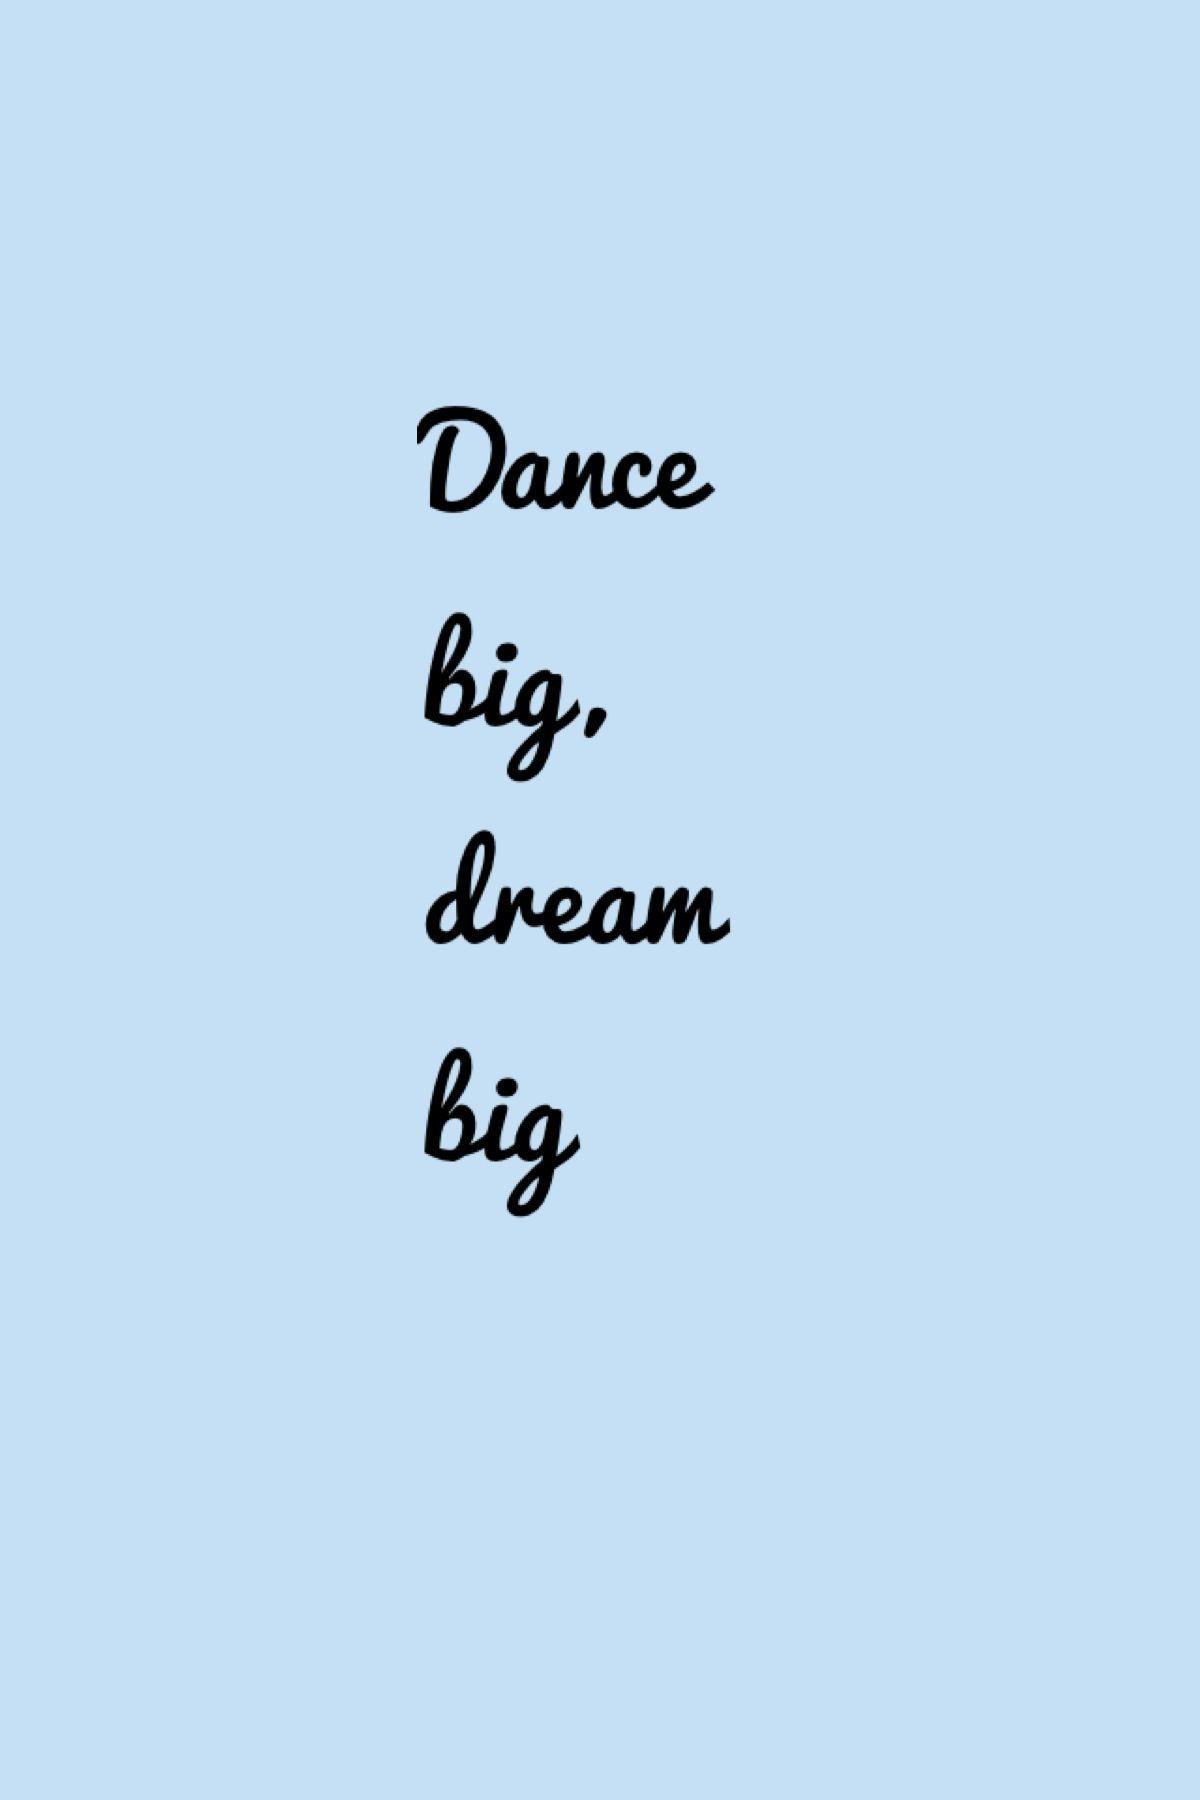 Wallpaper Dance Quotes : wallpaper, dance, quotes, Dance, Quotes, Wallpapers, Backgrounds, WallpaperAccess